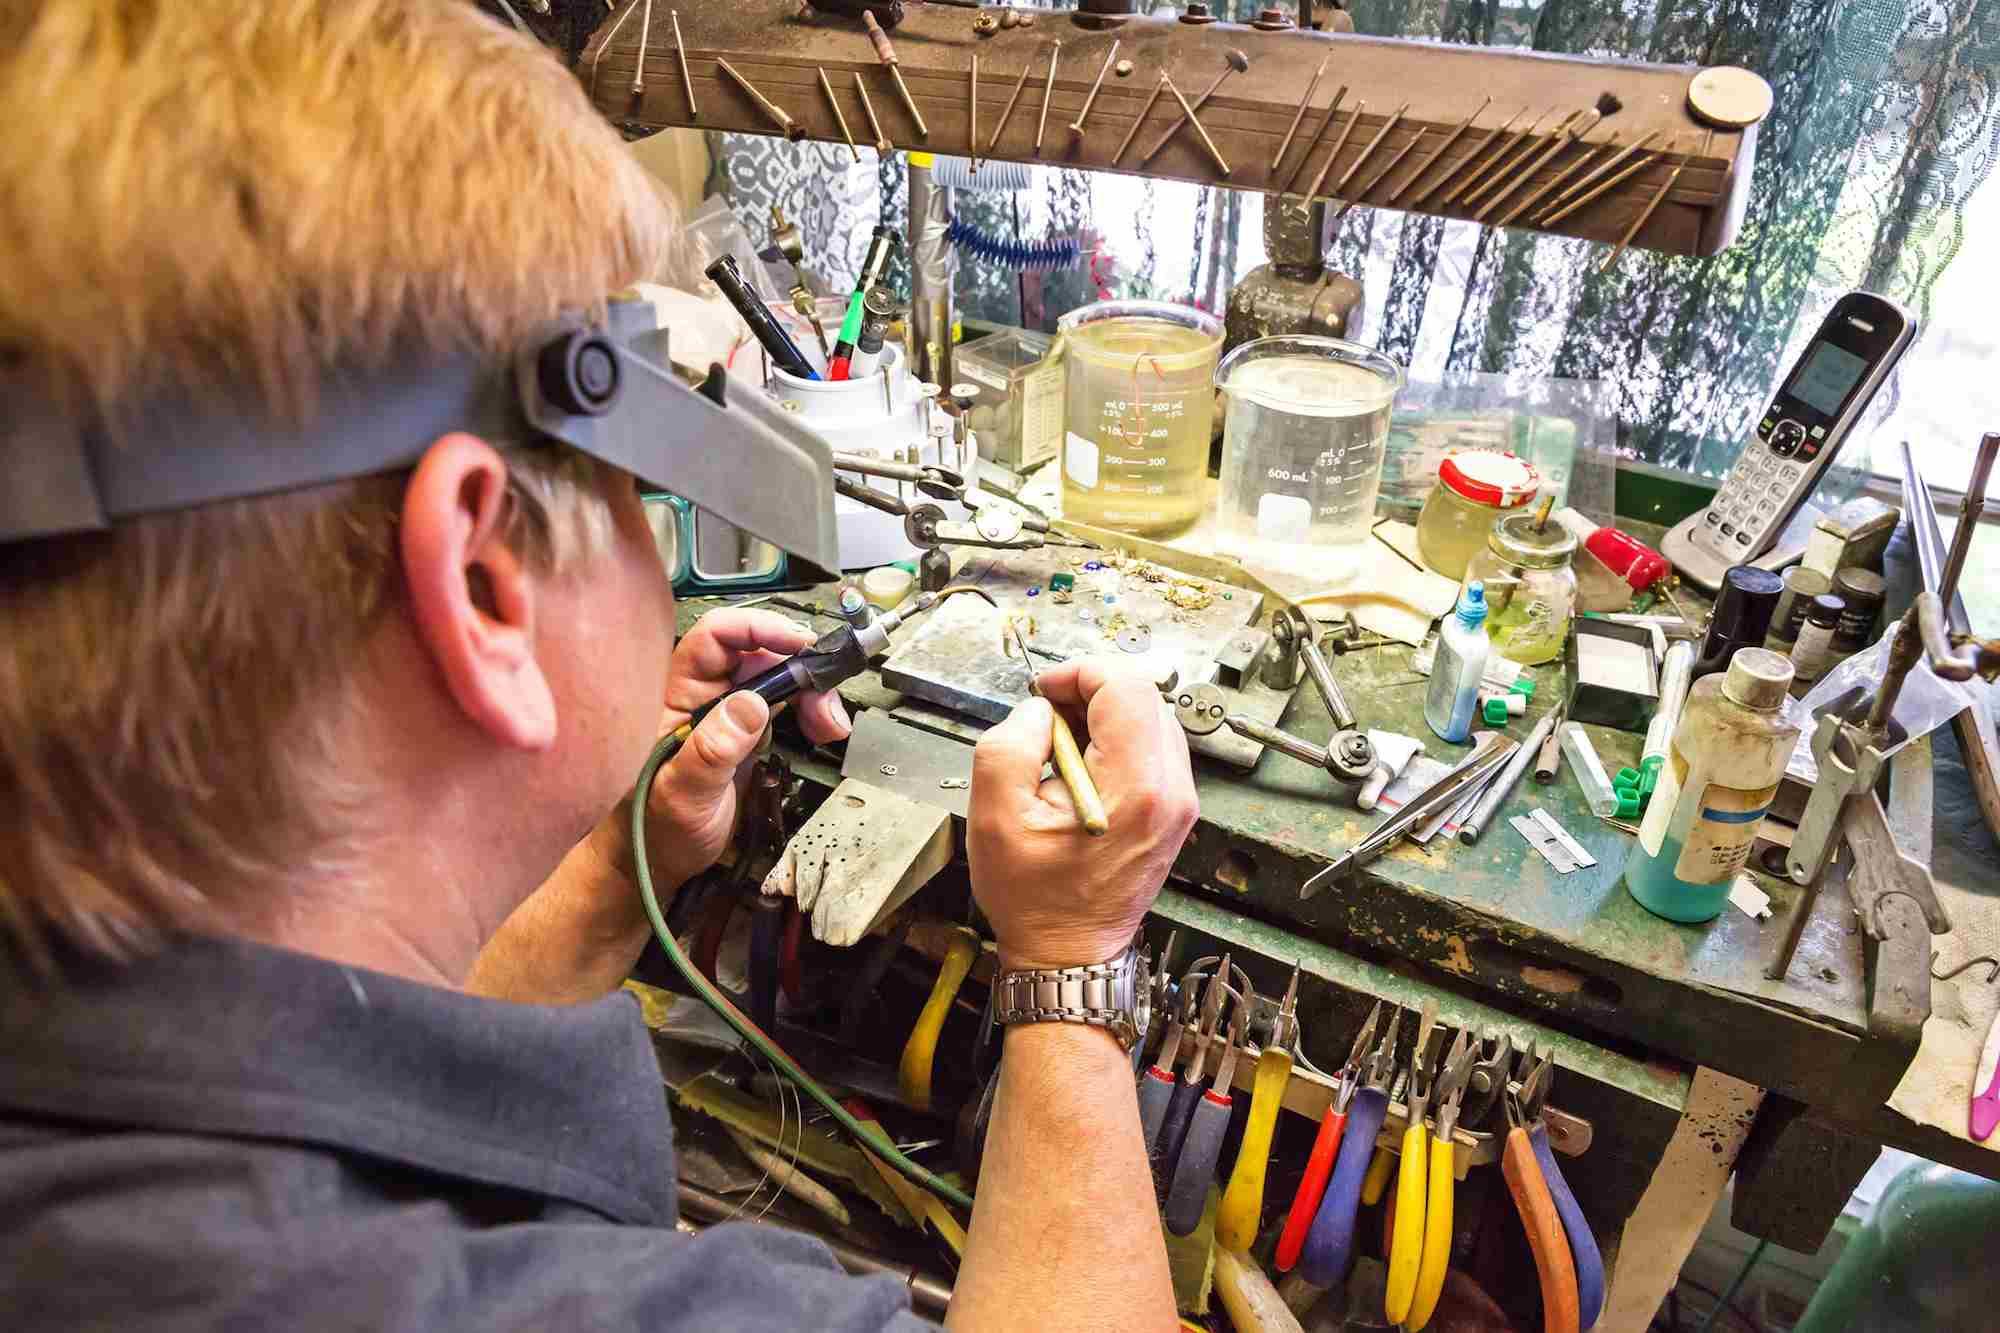 Jeweler at his workbench repairing a diamond ring